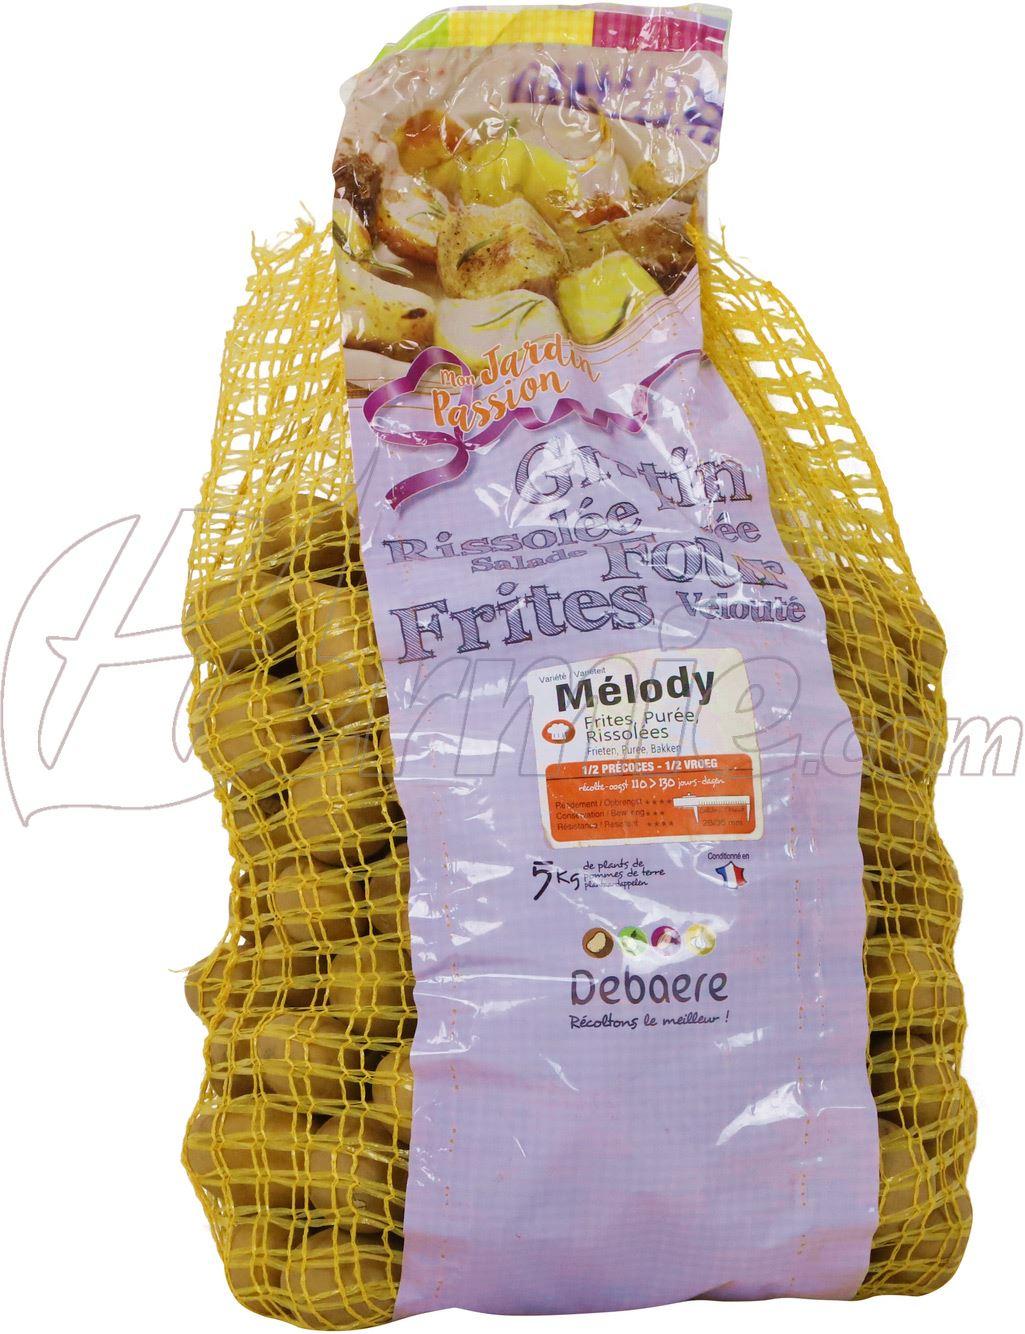 Pootaardappel-Melody-zak-5kg-28-35-Frankrijk-